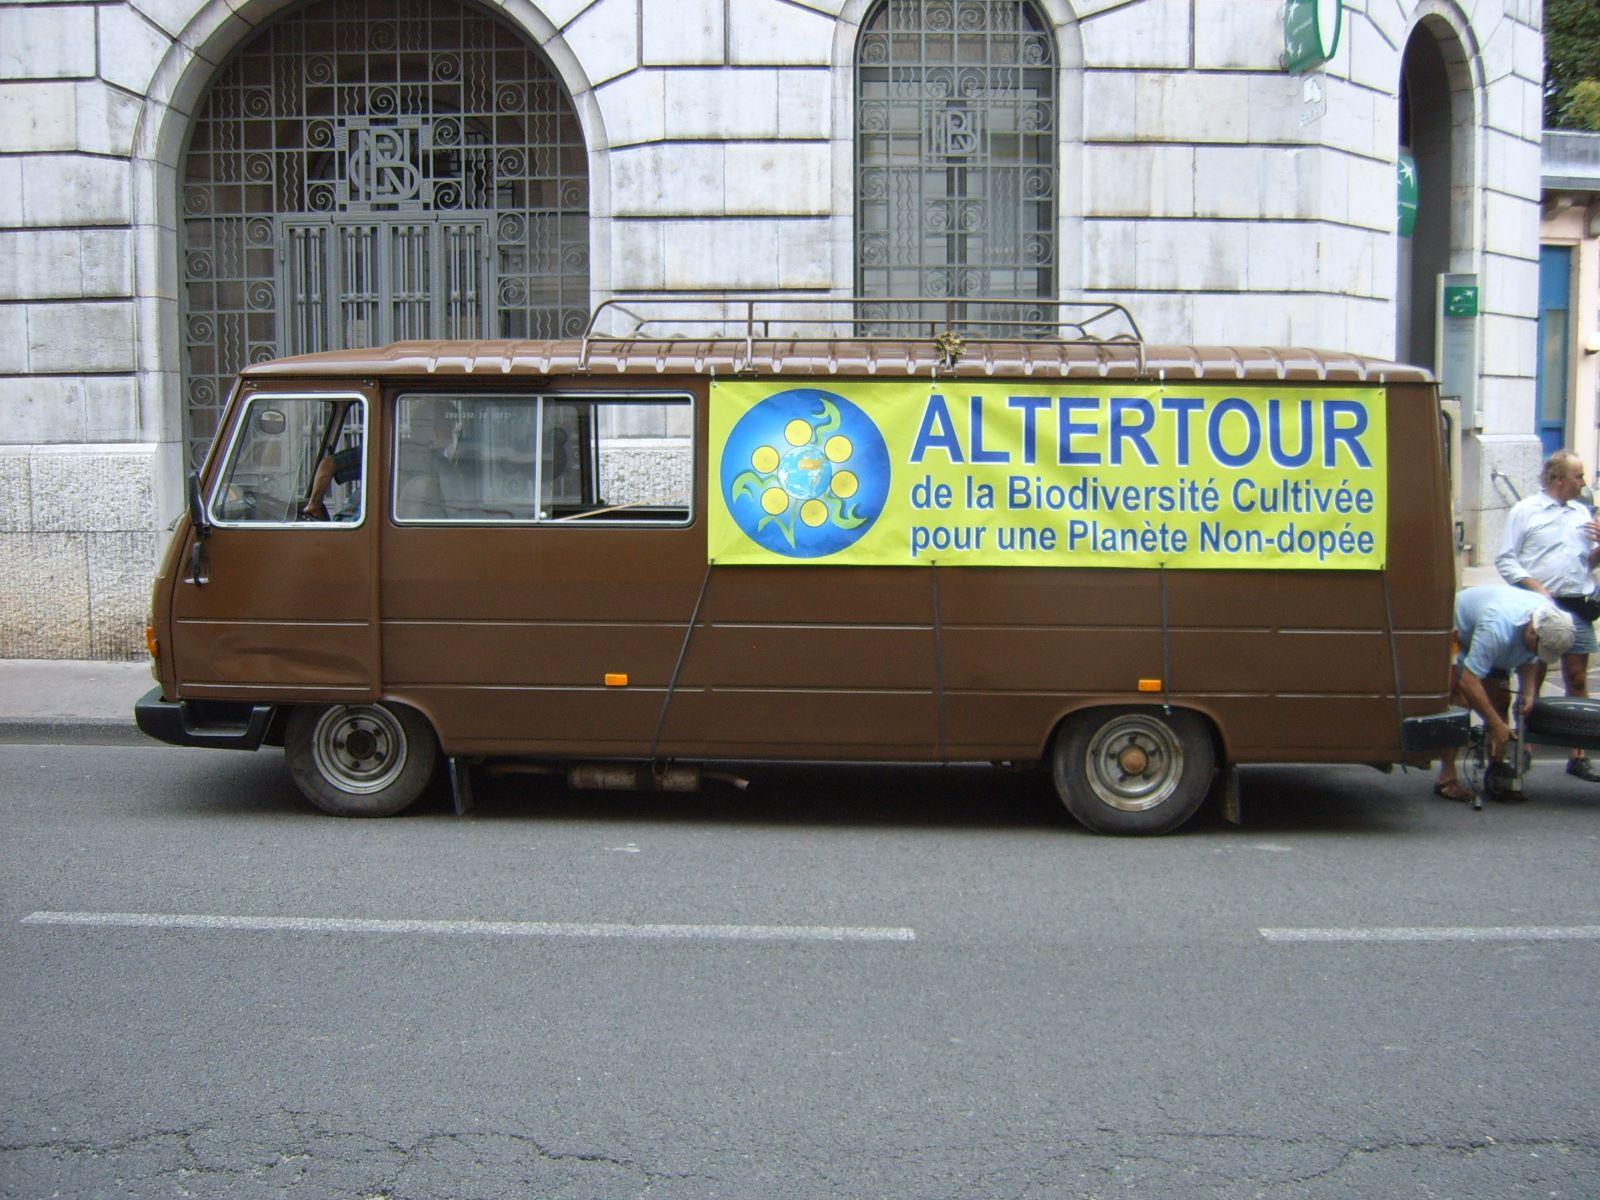 J9altertour